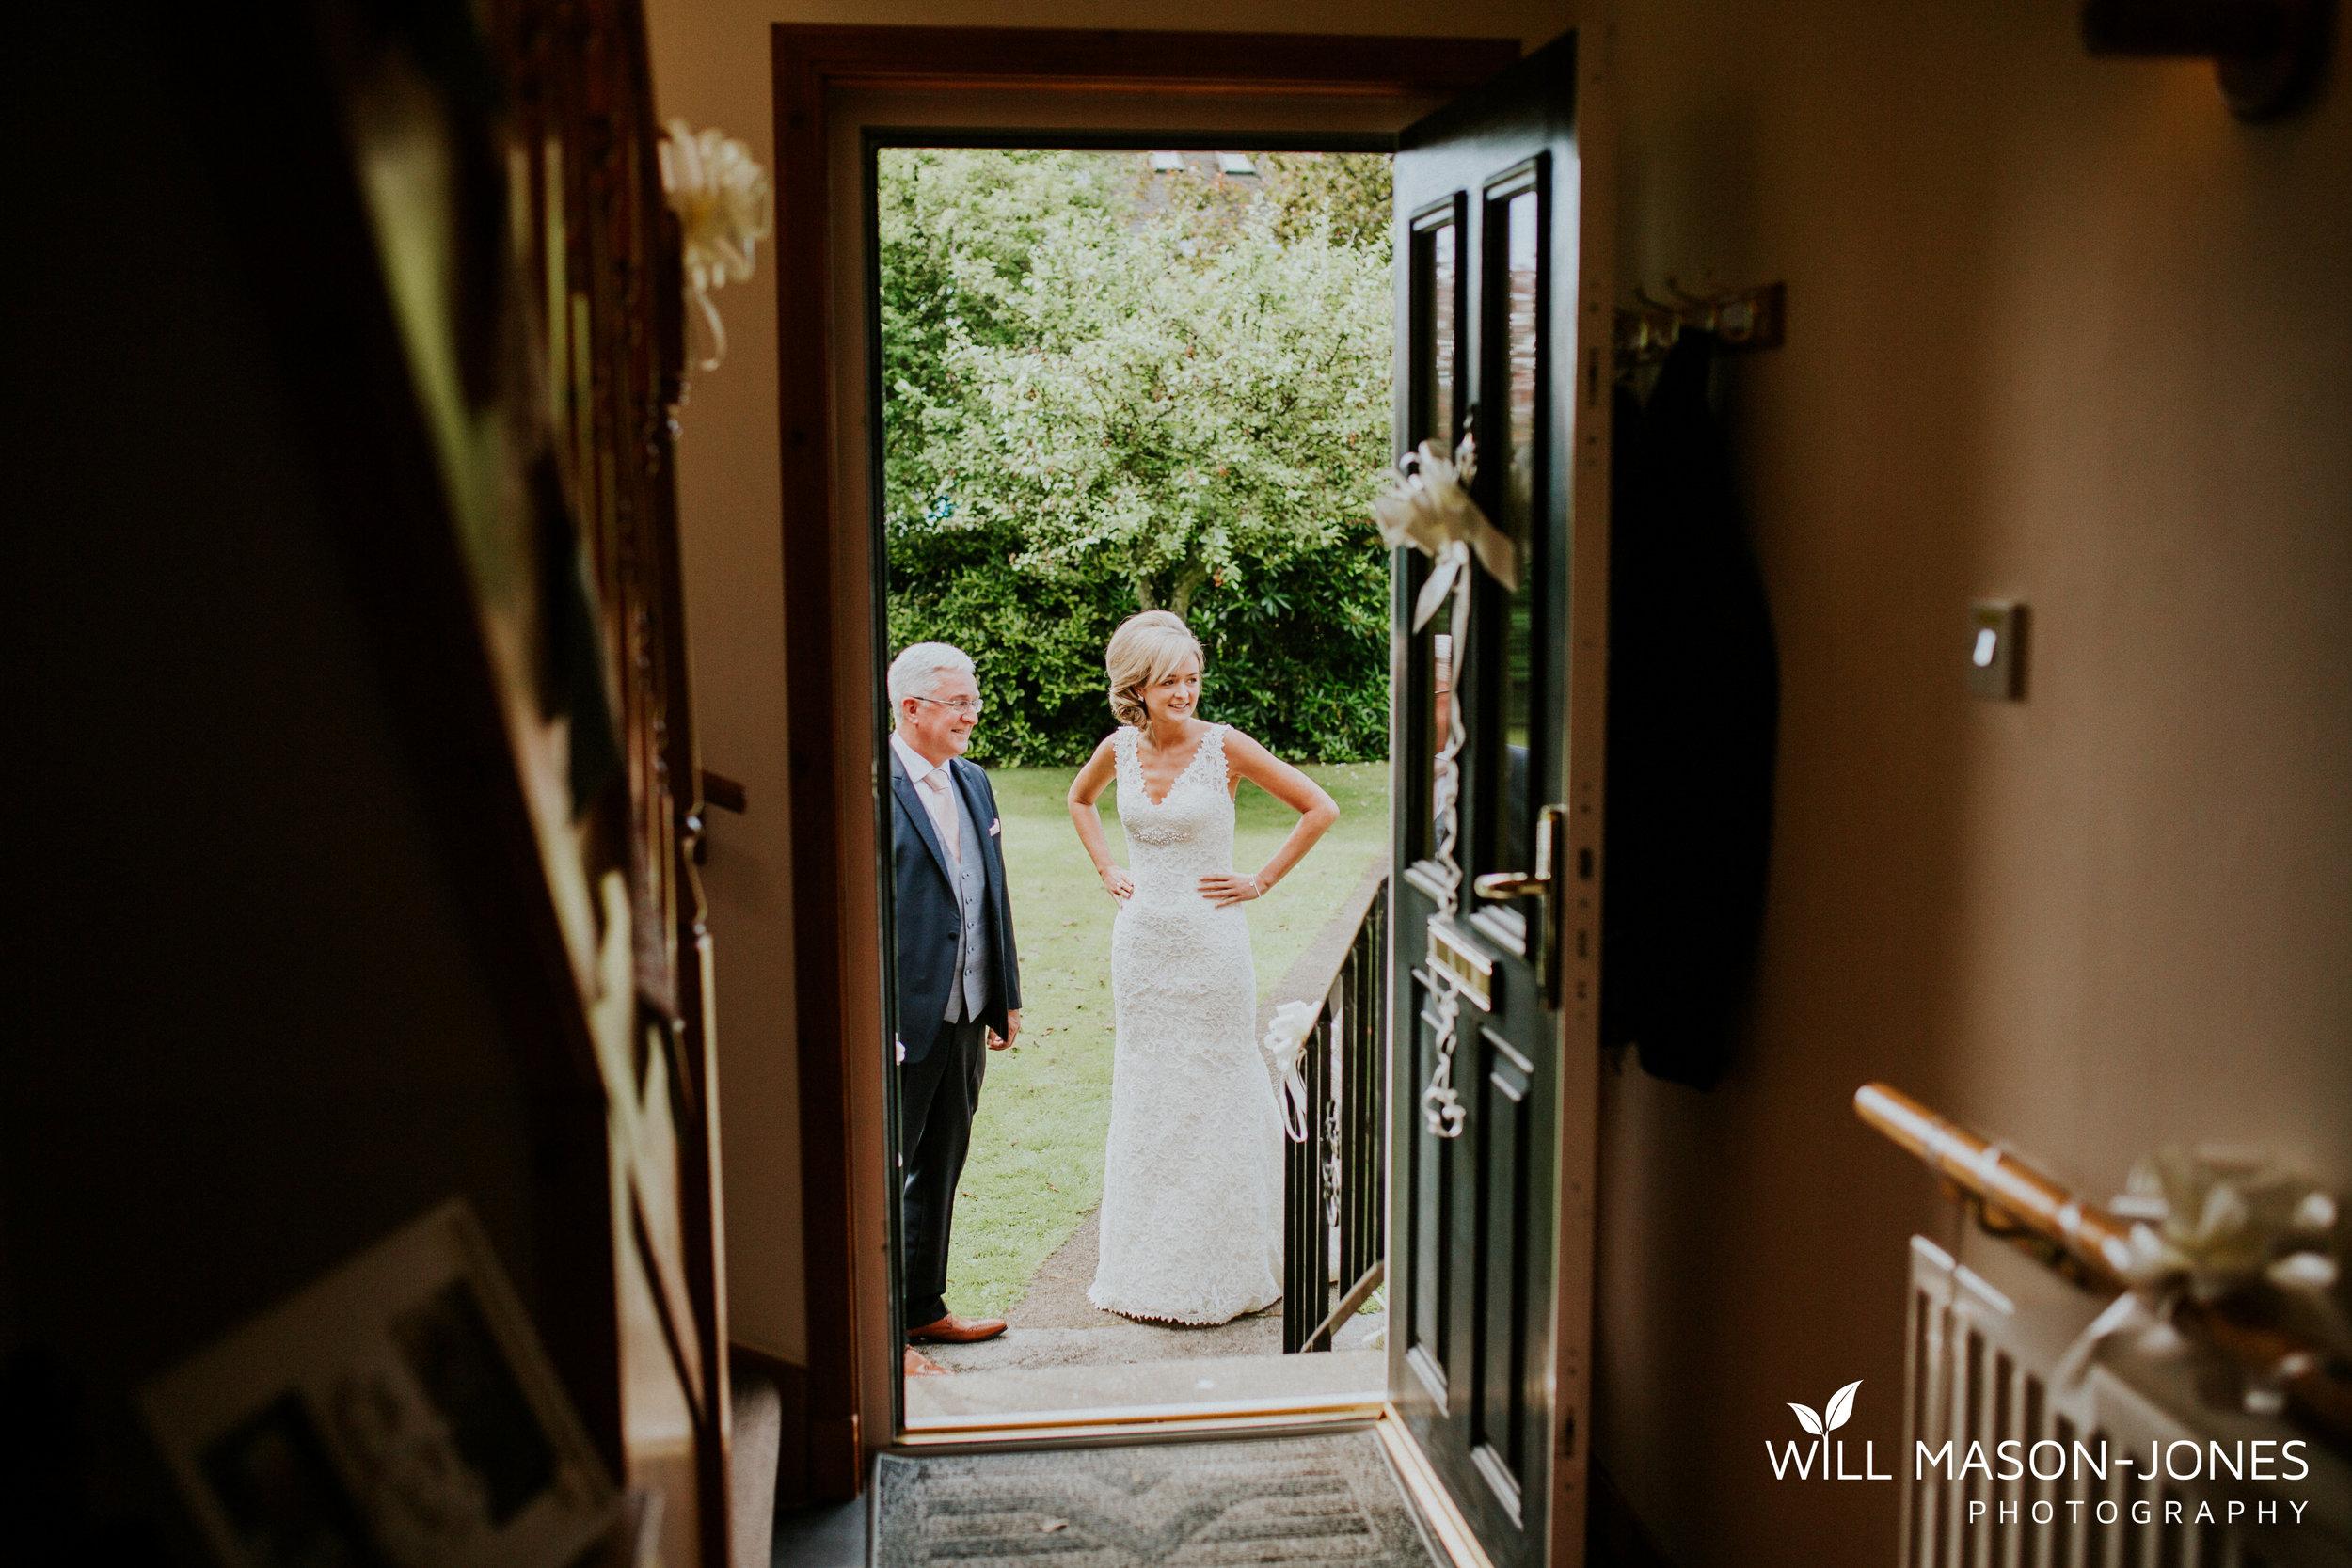 loch-lomond-destination-wedding-photographer-scotland-uk-wales-28.jpg